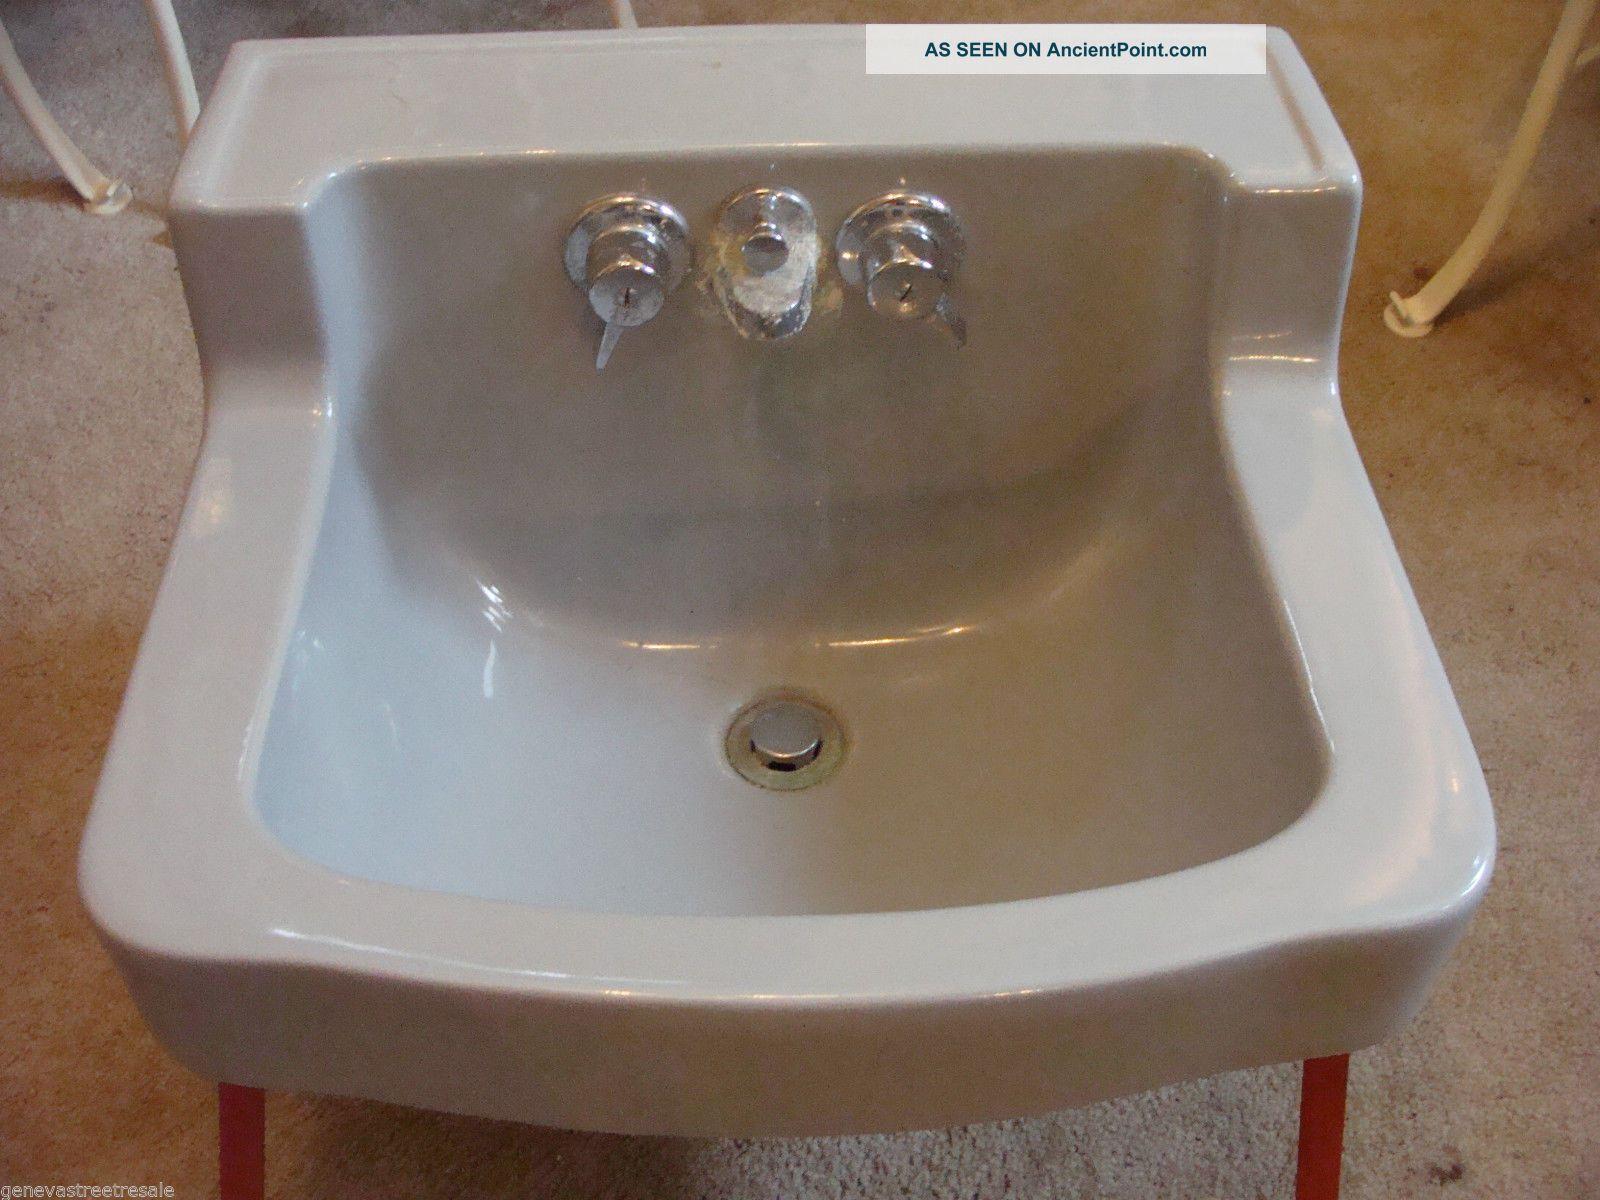 Briggs Bathroom Sinks : Vintage Briggs Bathroom Kitchen Gray Porcelain Sink W/fixtures Mid ...